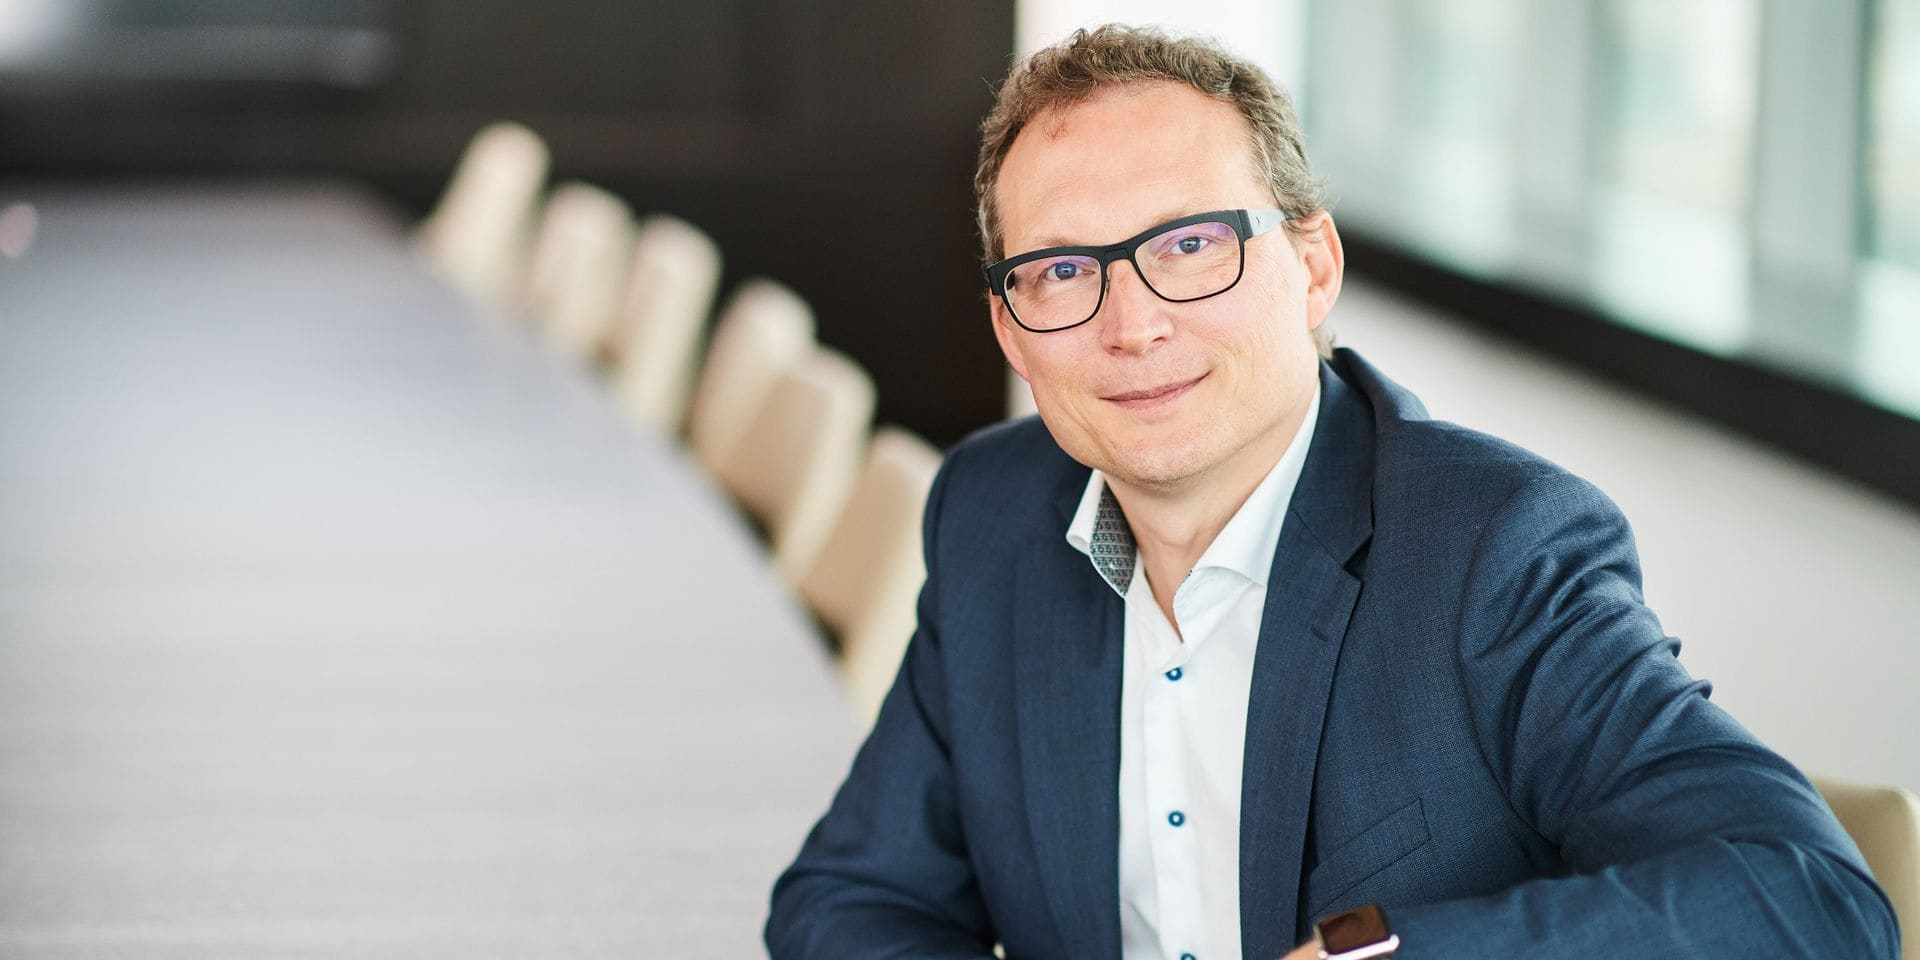 Stefaan Gielens, CEO d'Aedifica depuis 2006.